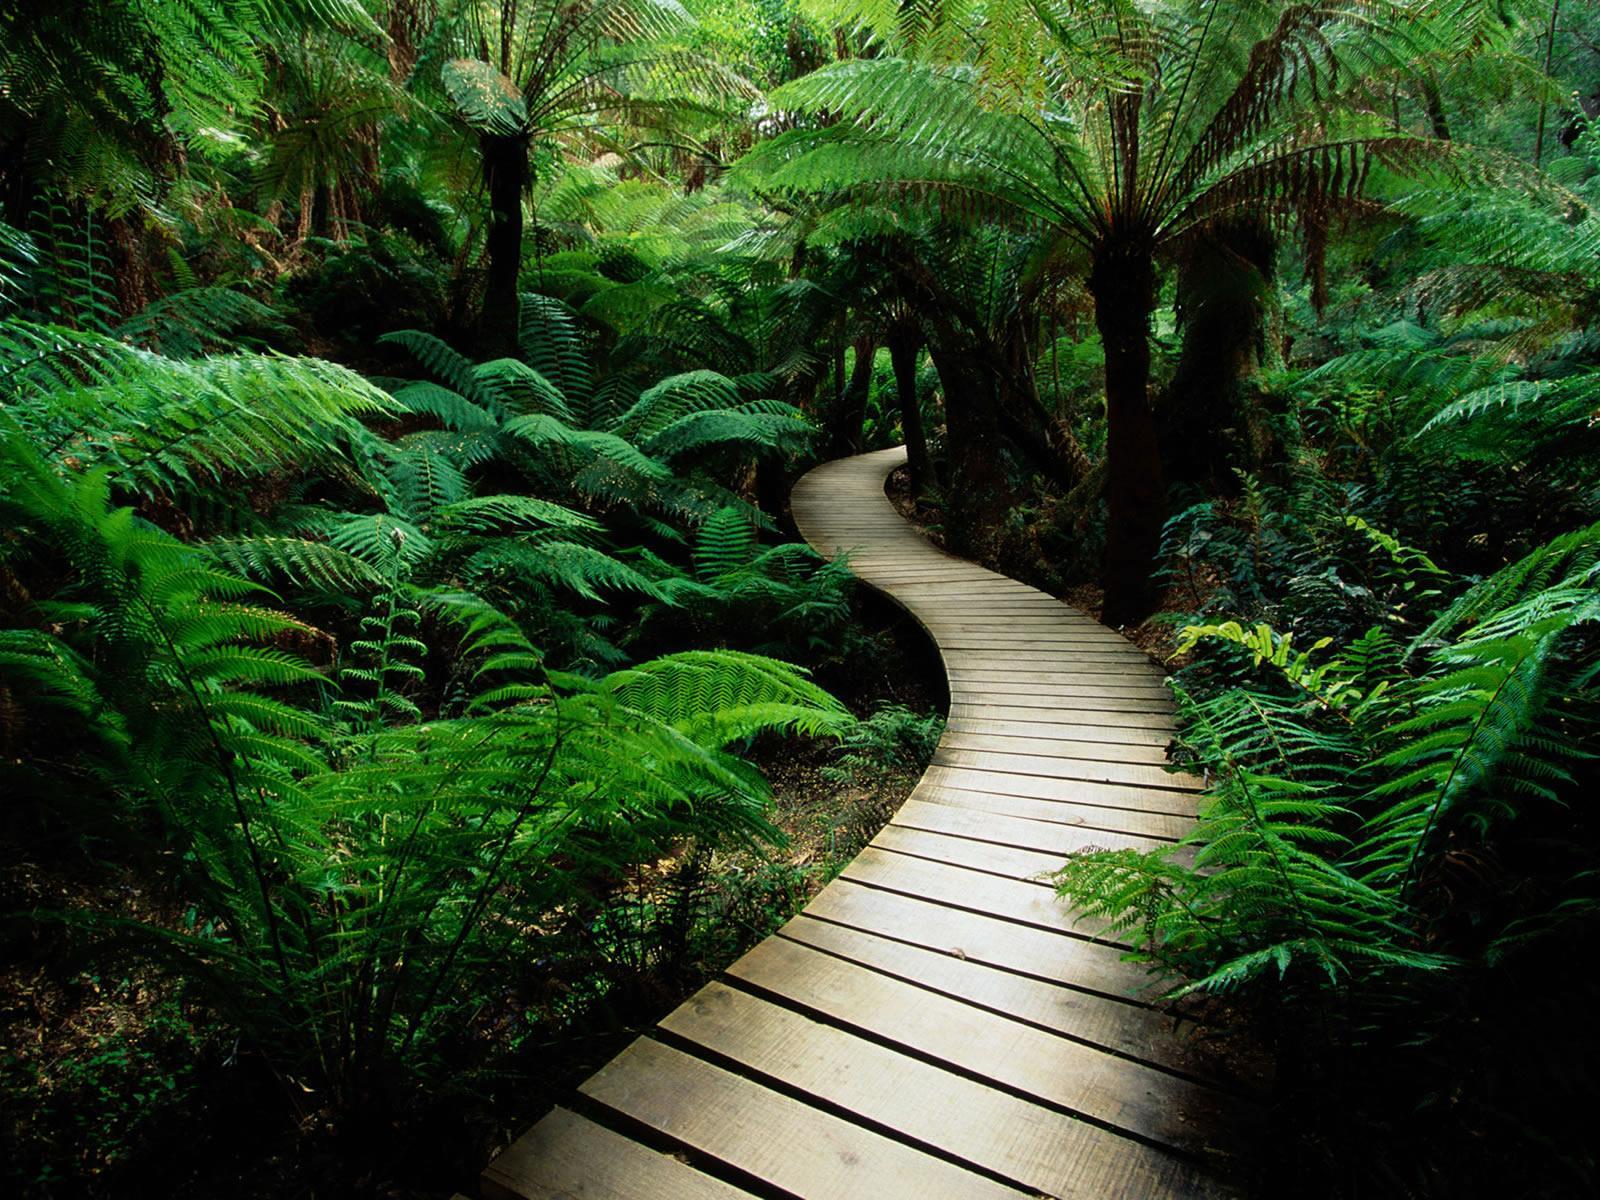 meditation mindfulnesseightfold path